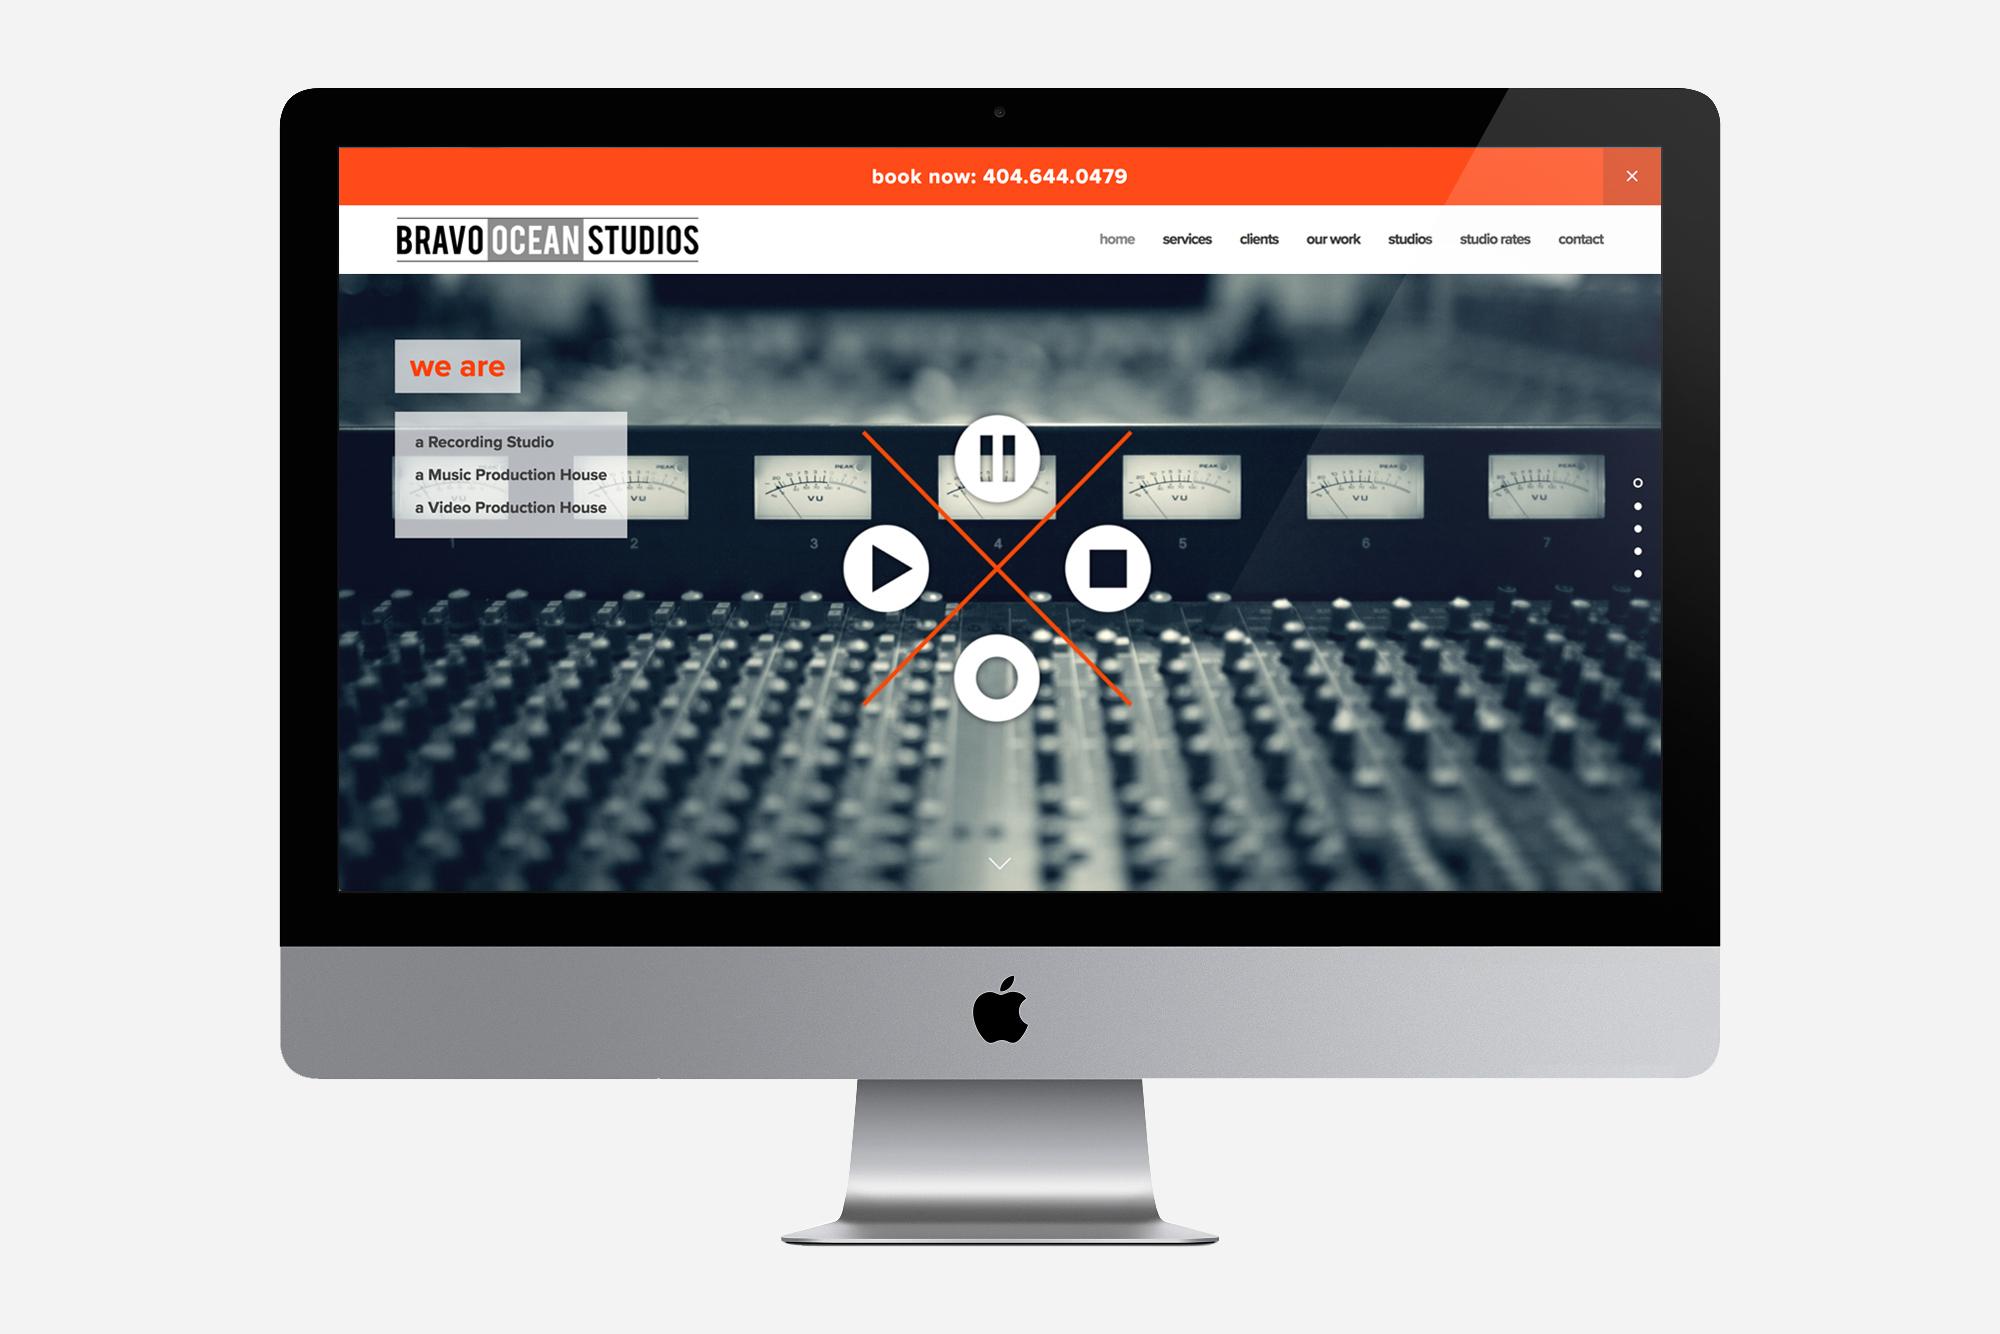 Bravo Ocean Studios